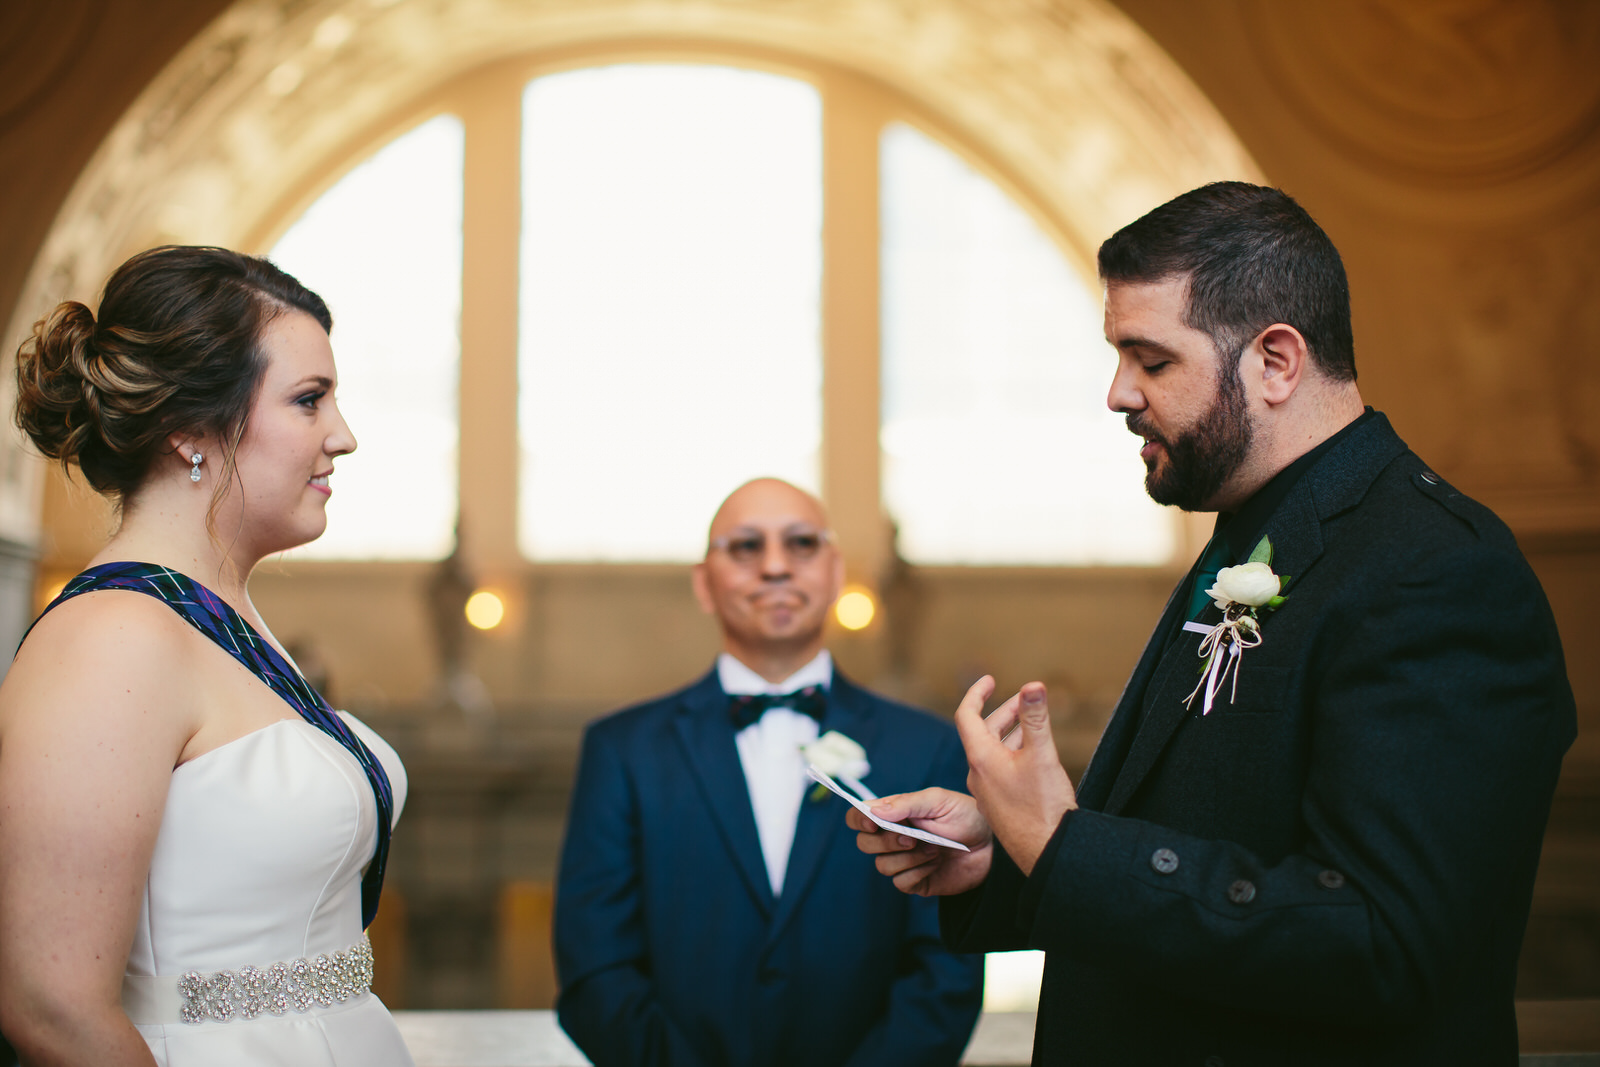 groom_vows_wedding_ceremony.jpg